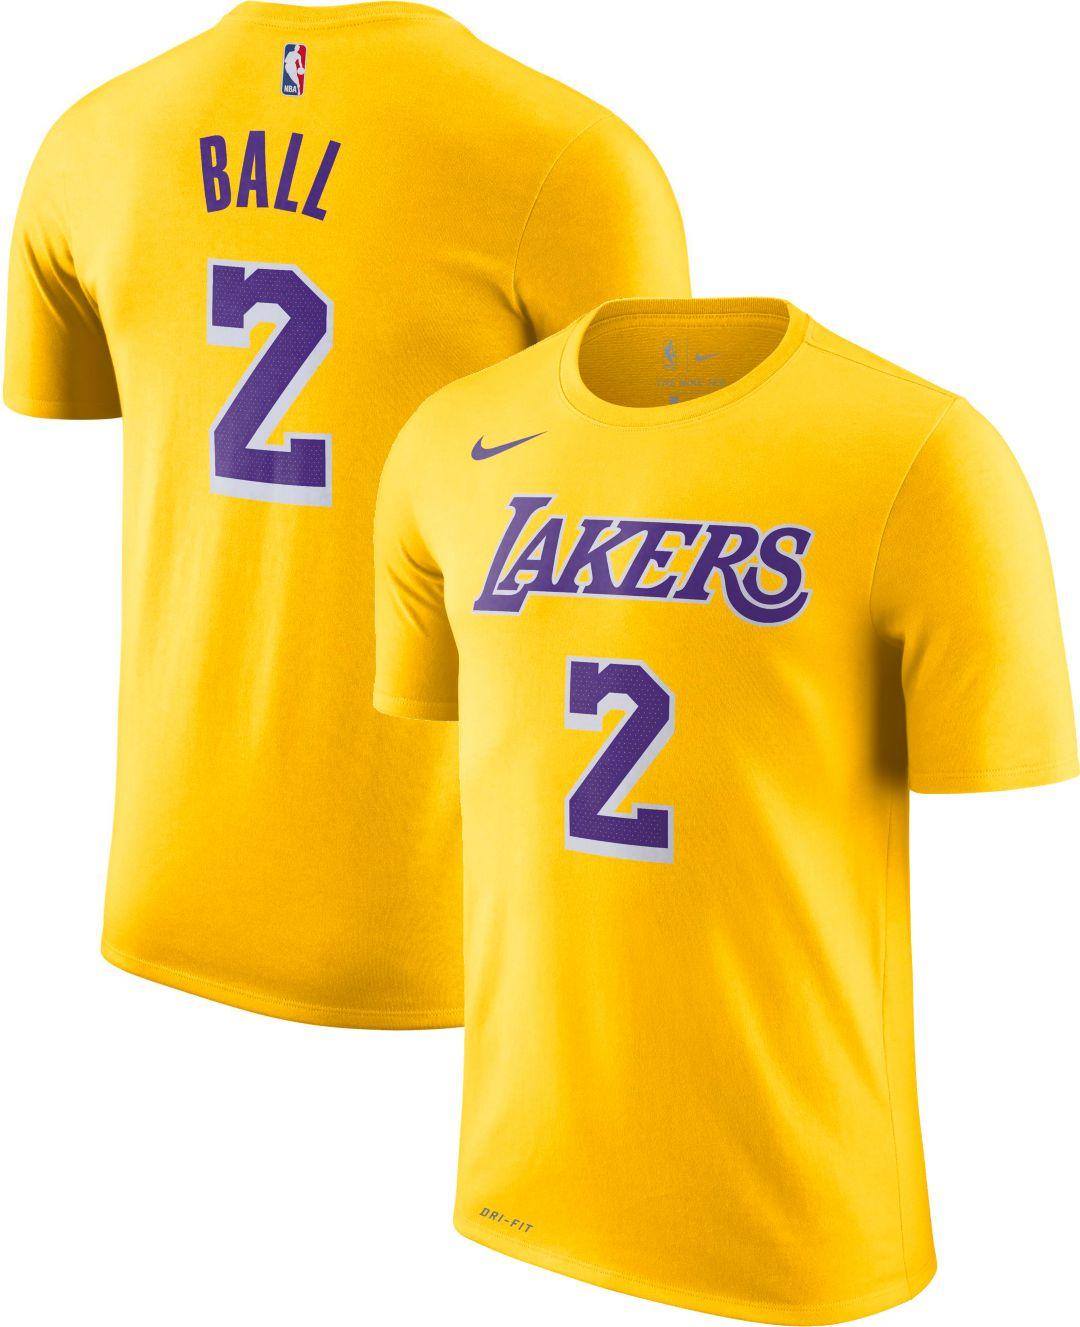 db6187731f1 Nike Men s Los Angeles Lakers Lonzo Ball  2 Dri-FIT Gold T-Shirt ...